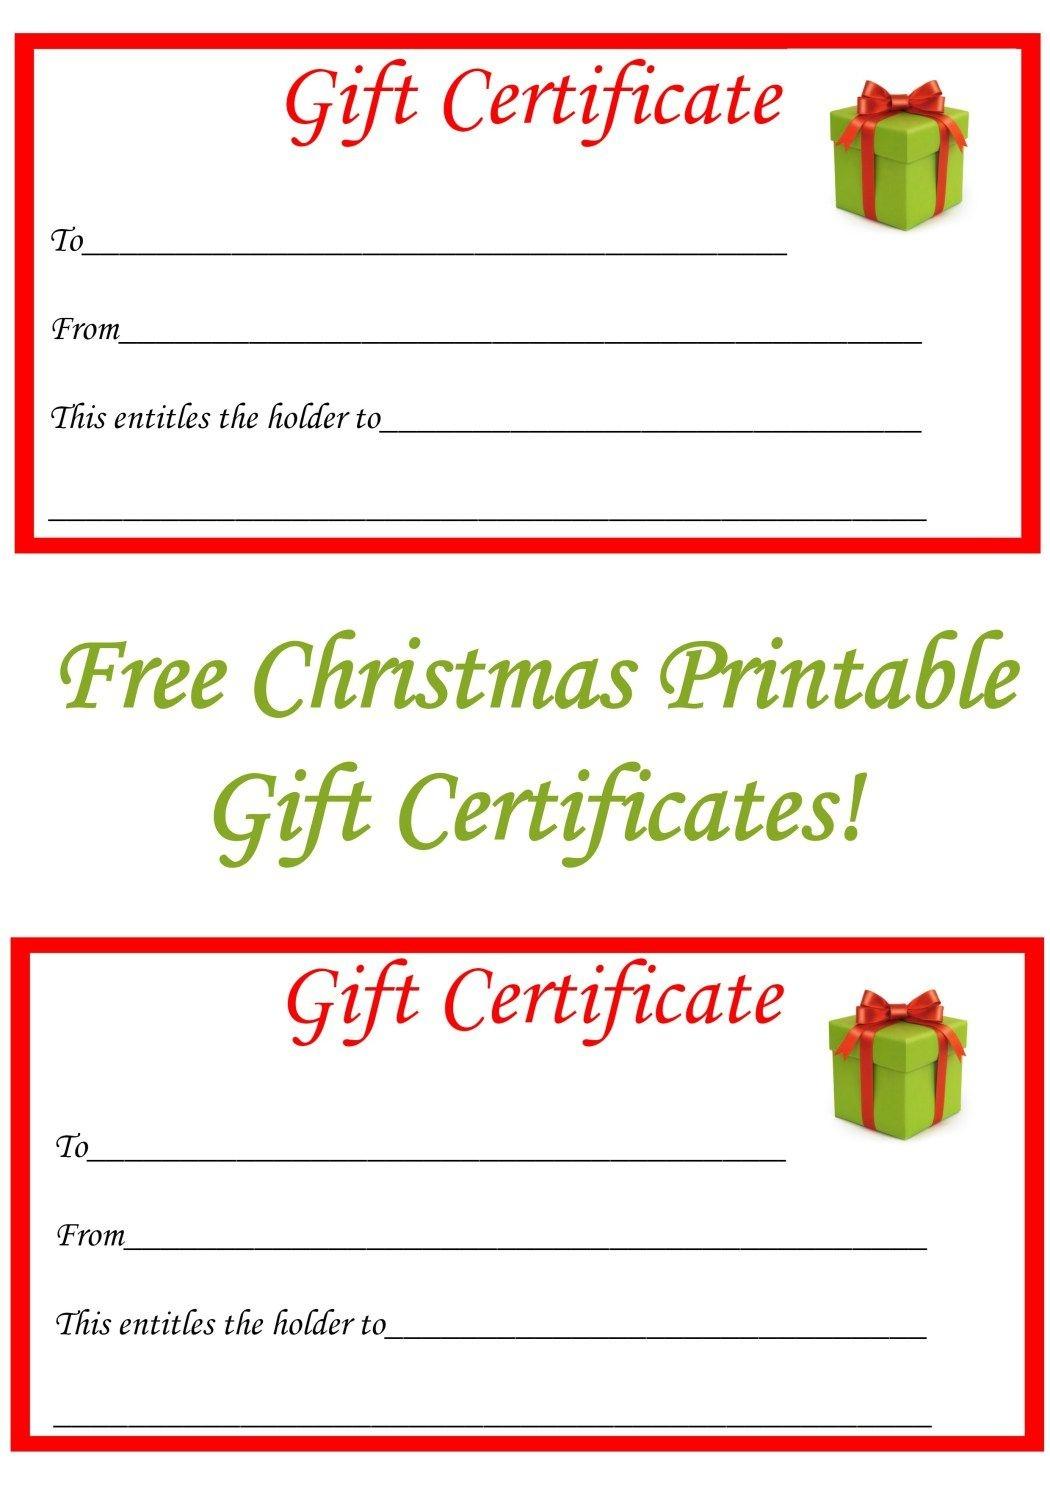 Free Christmas Printable Gift Certificates | Gift Ideas | Christmas - Free Printable Gift Coupons